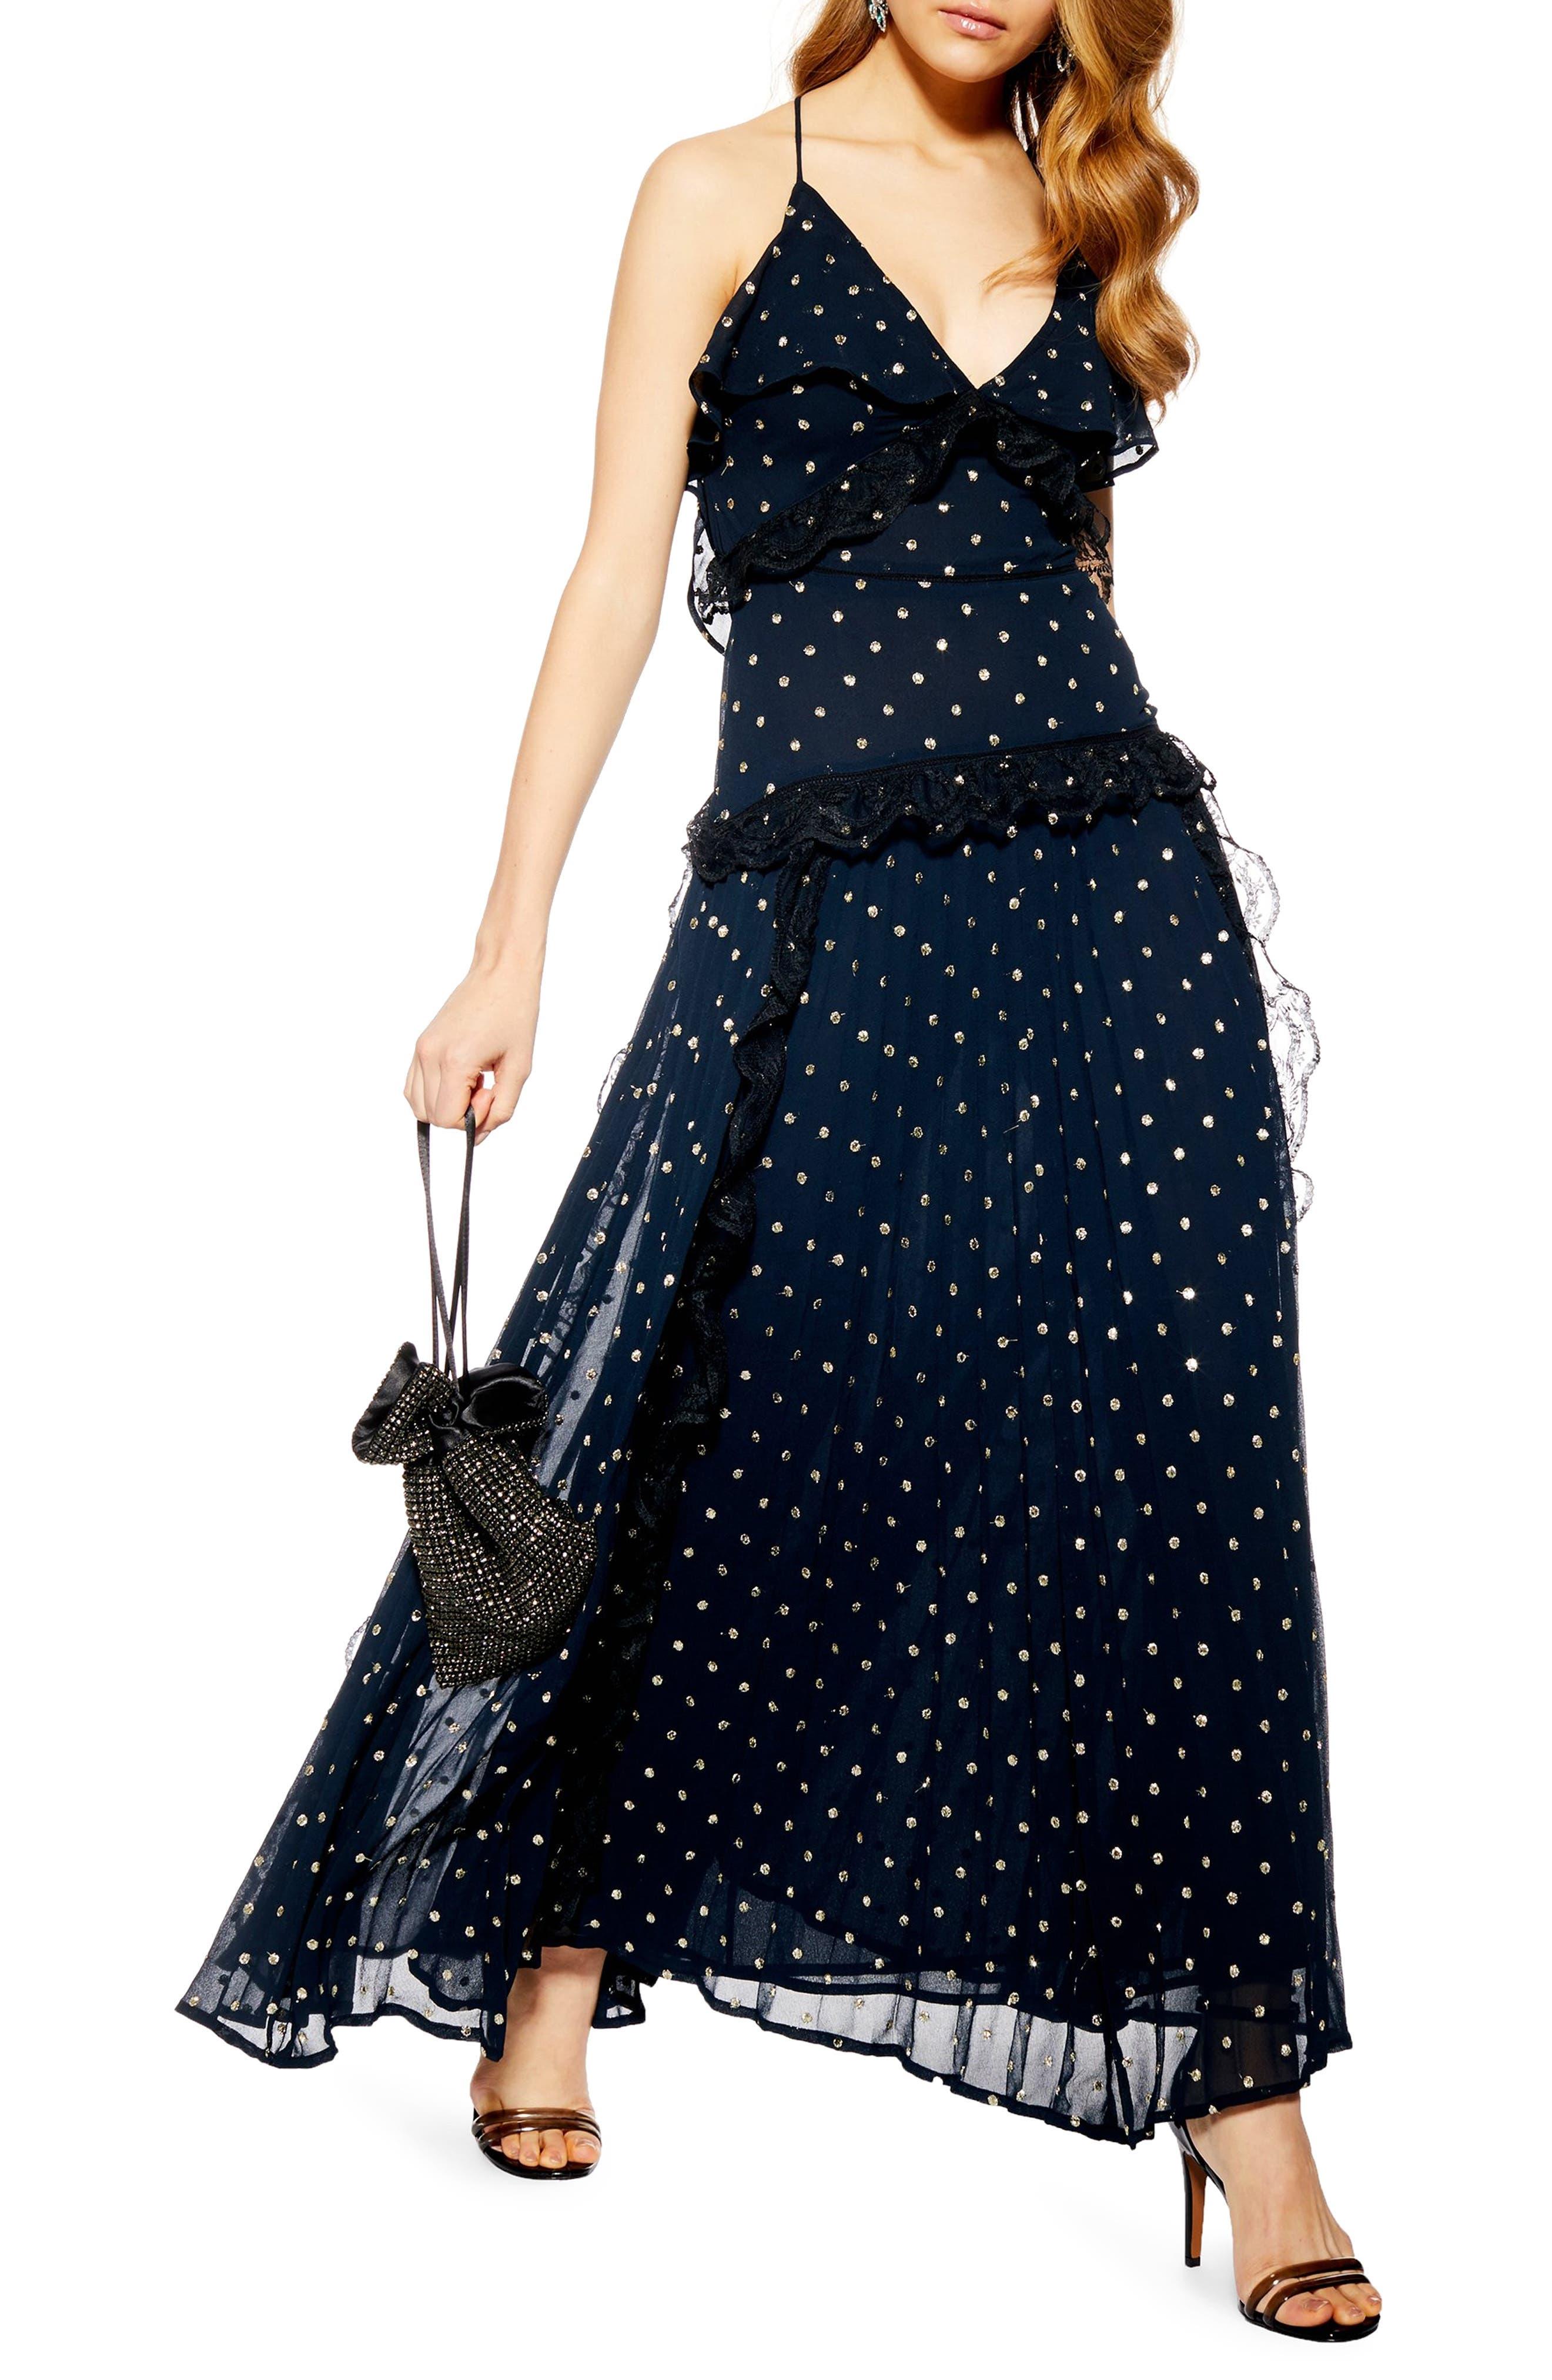 Topshop Lace Metallic Dot Maxi Dress, US (fits like 2-4) - Blue